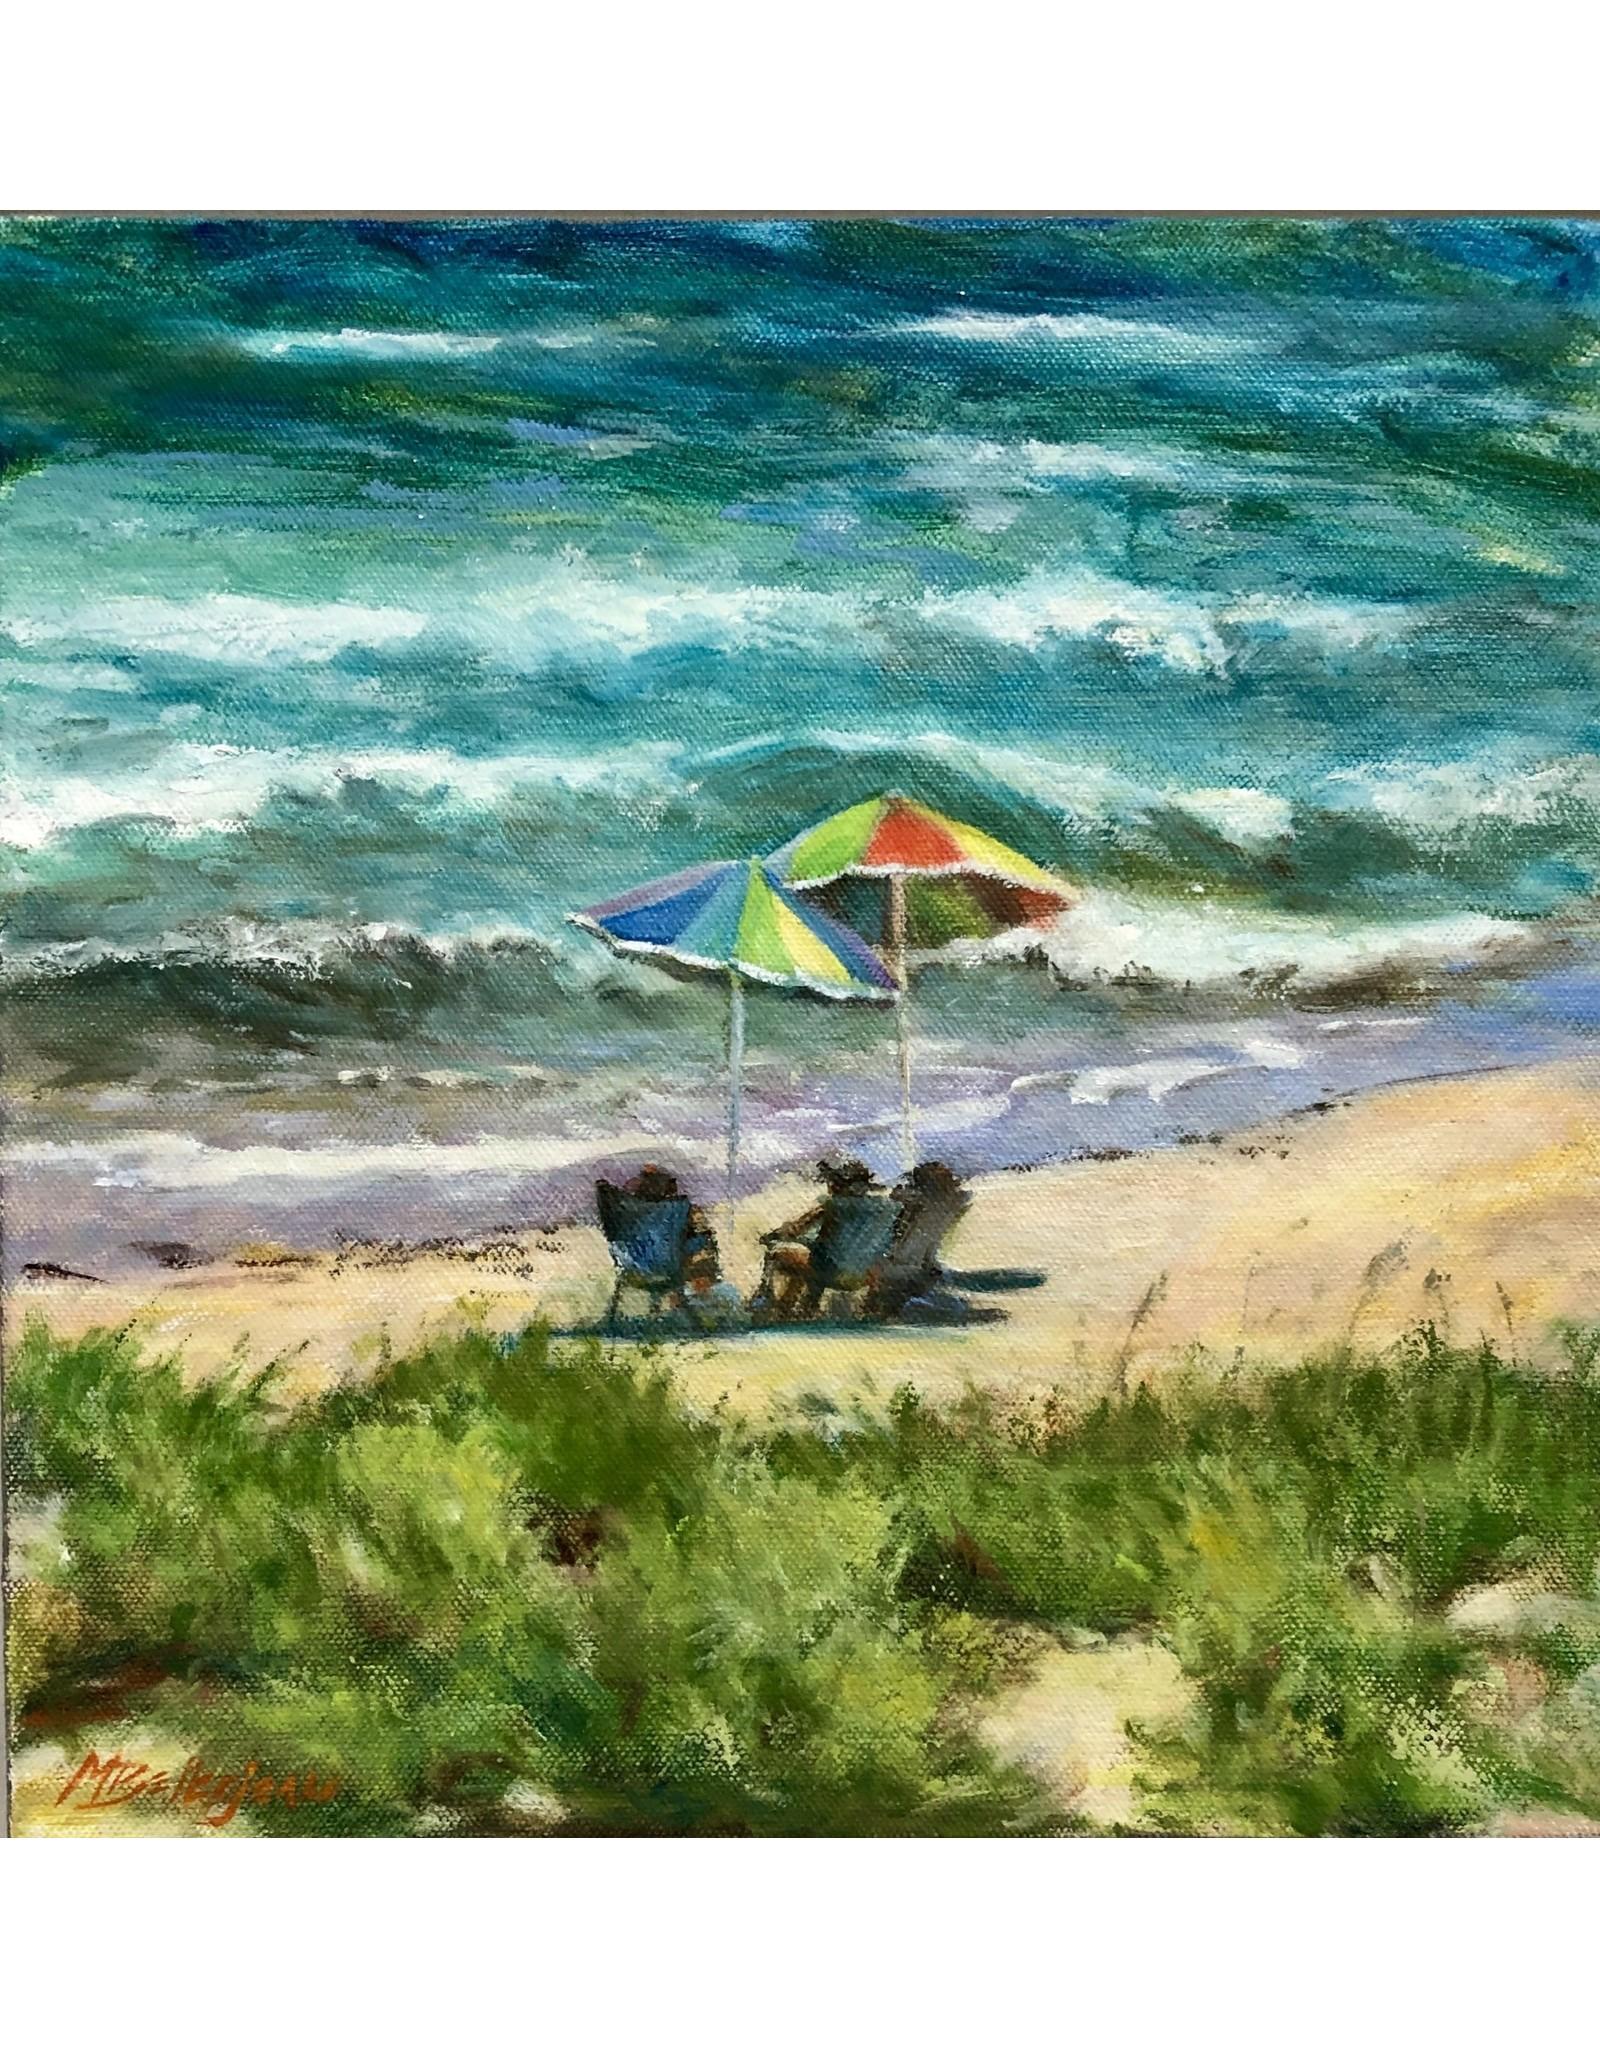 Michaelann Bellerjeau SANTA LUCIA SUNDAY, oil on gallery wrap canvas, 12x12, MICB)